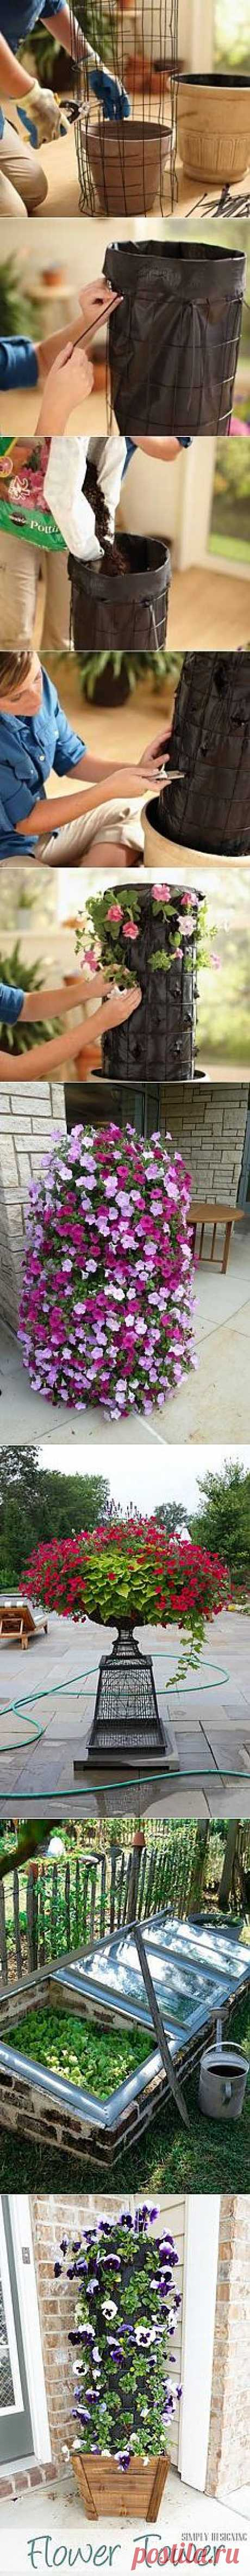 Alternative Gardning: How to Make Petunia Bashnya | Gardening